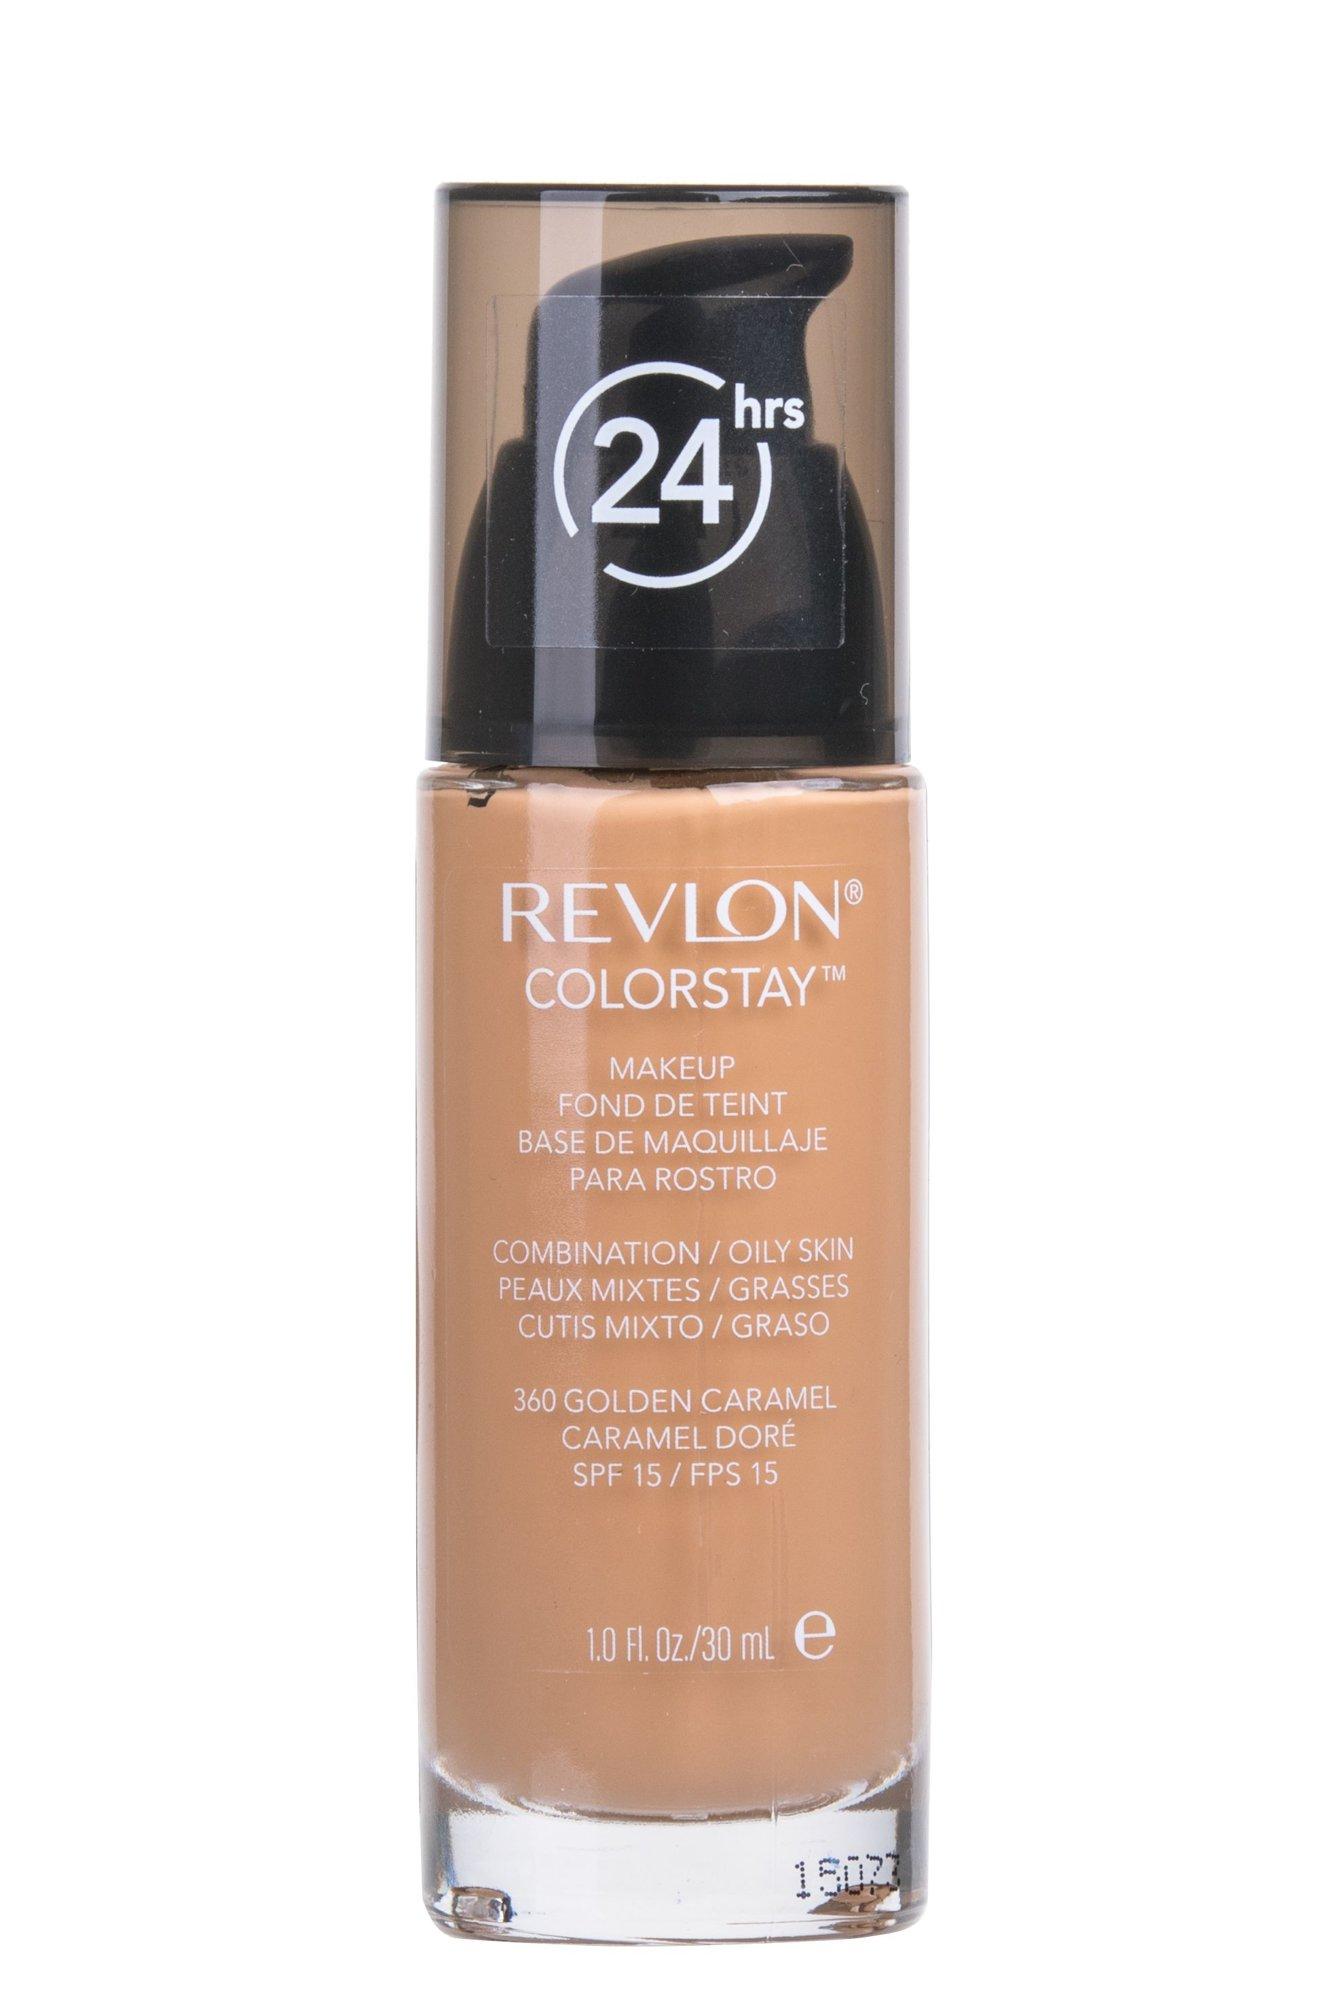 Revlon Colorstay Cosmetic 30ml 360 Golden Caramel